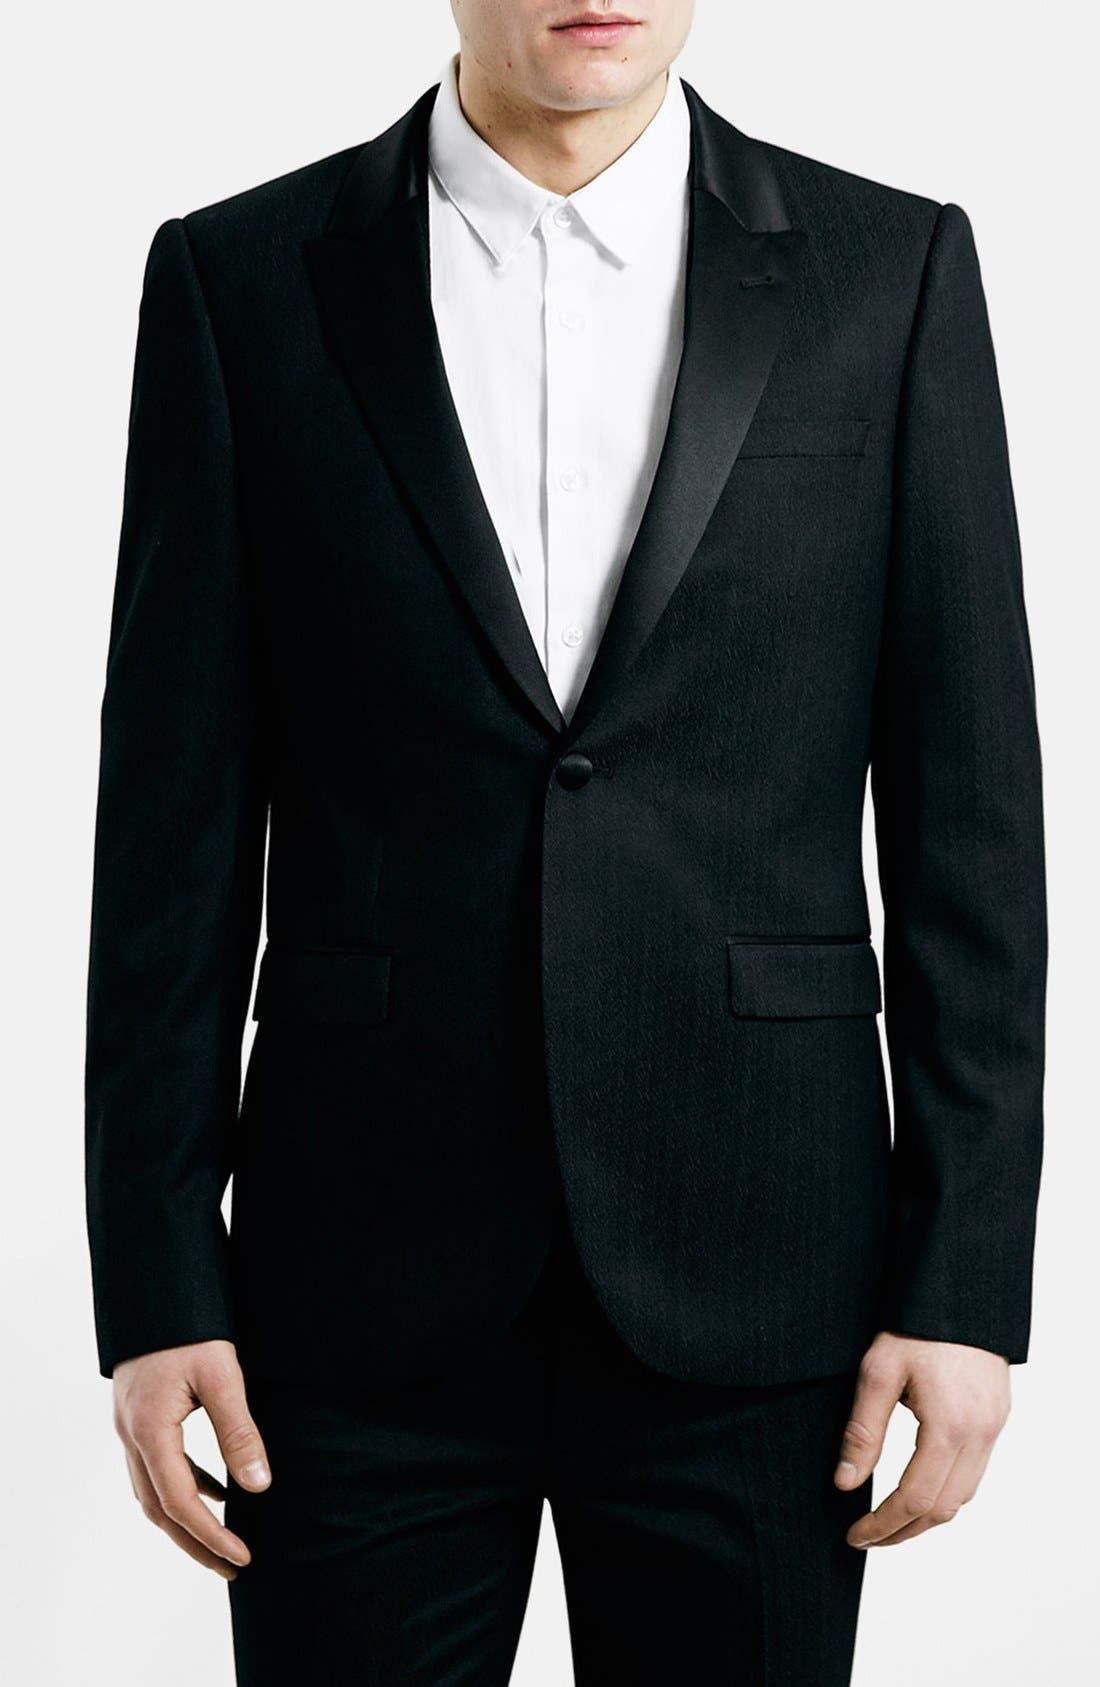 TOPMAN, Black Textured Skinny Fit Tuxedo Jacket, Main thumbnail 1, color, 001